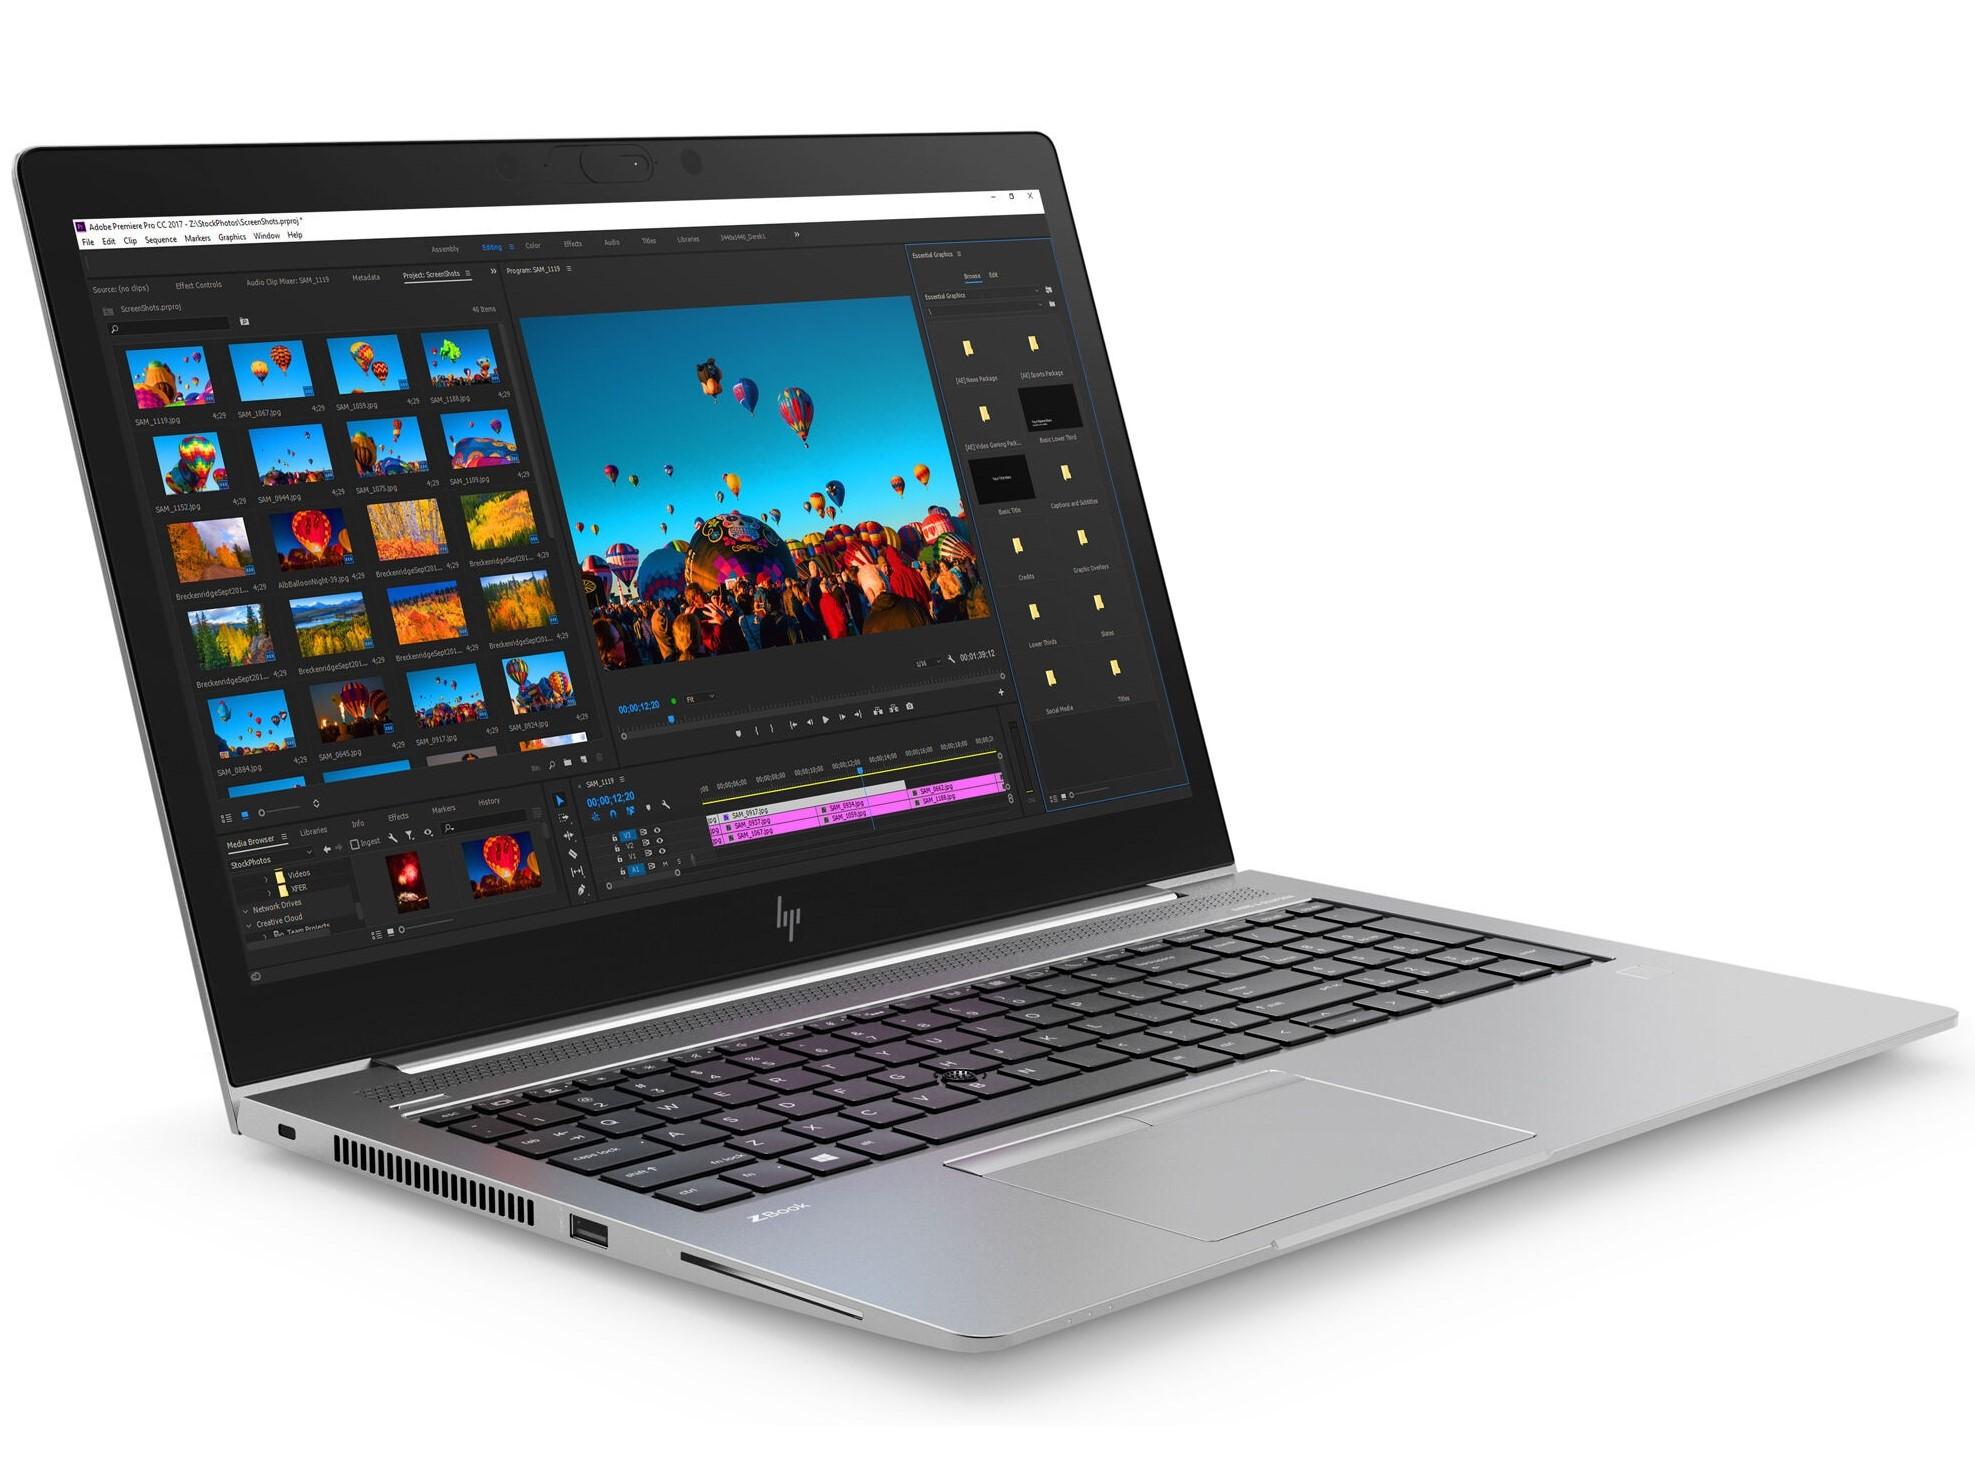 TOPOSH (P7) 14 inch 8G RAM 120/240/512GB SSD Intel quad core i5 4210U Untral thin gaming laptop